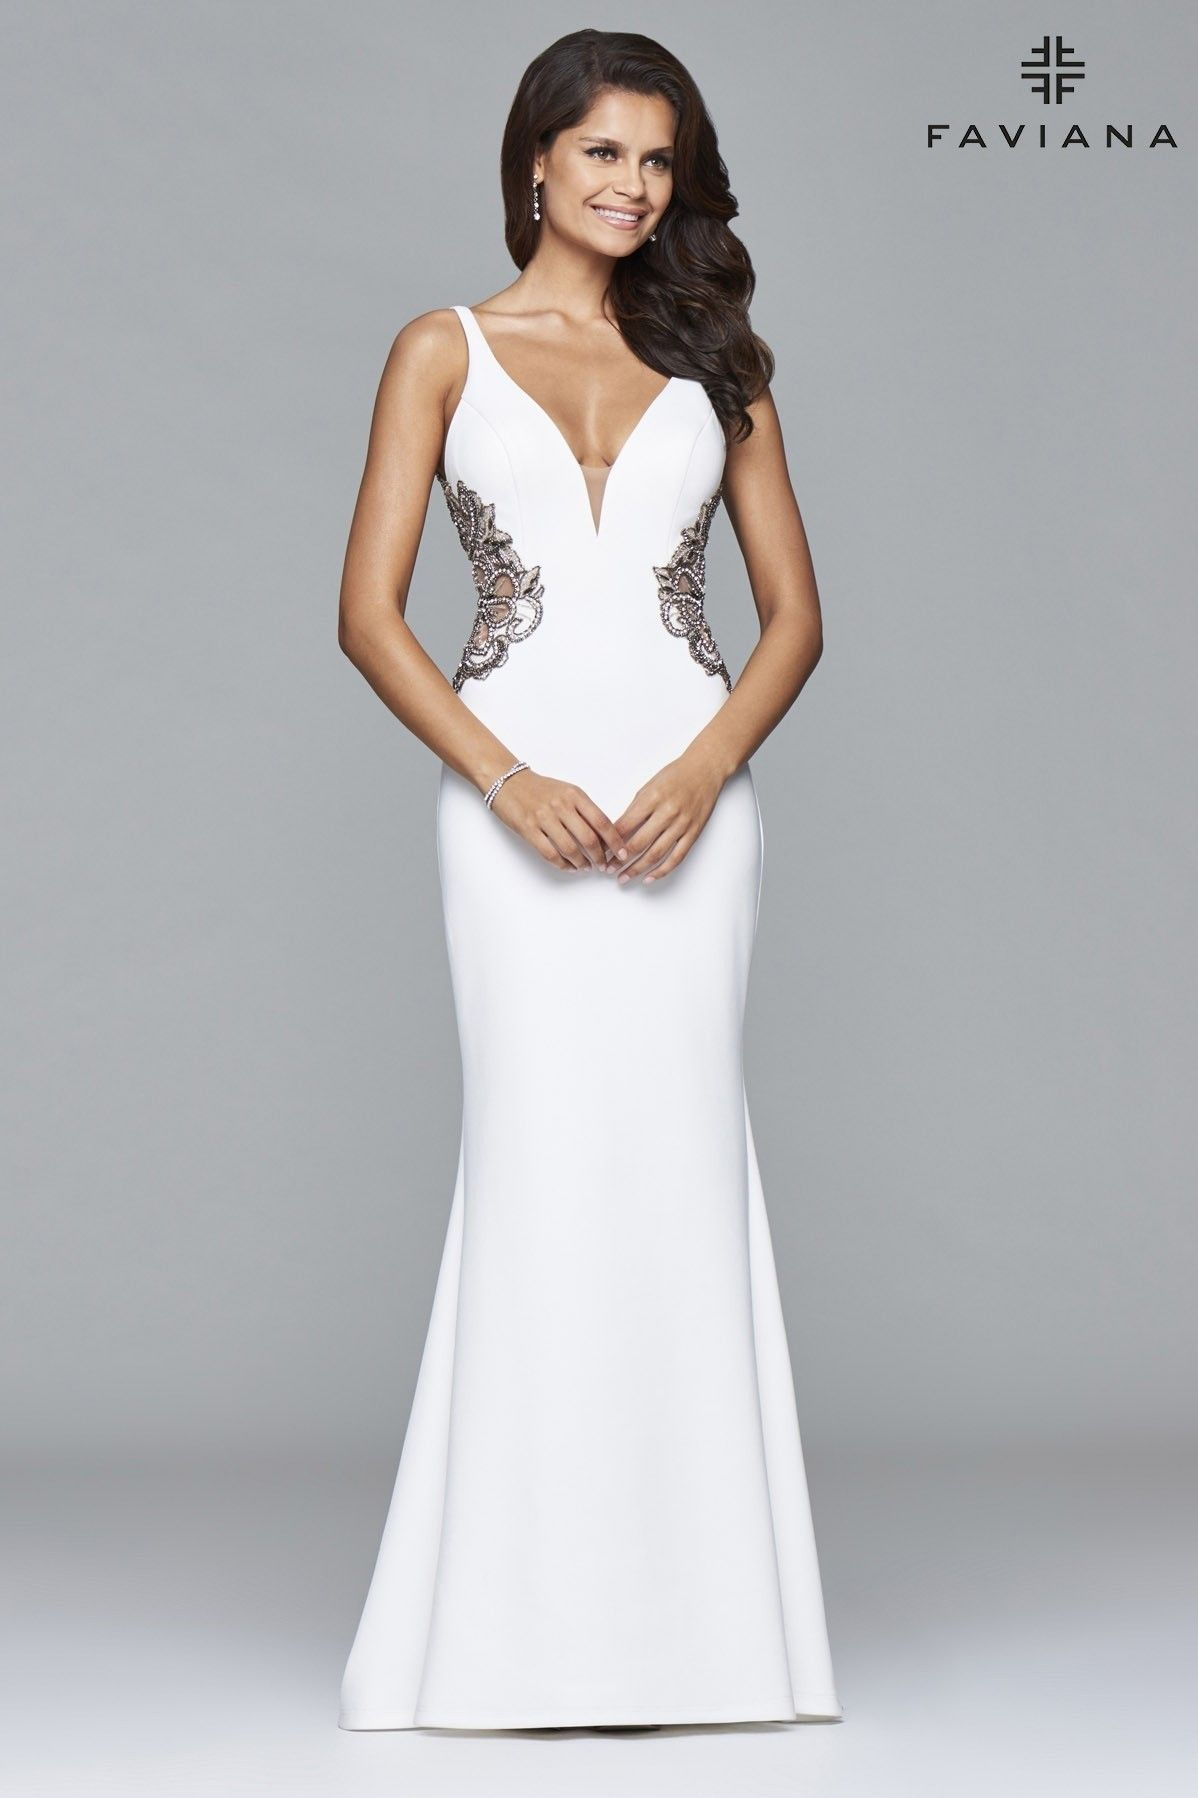 S all faviana dresses pinterest dresses prom dresses and